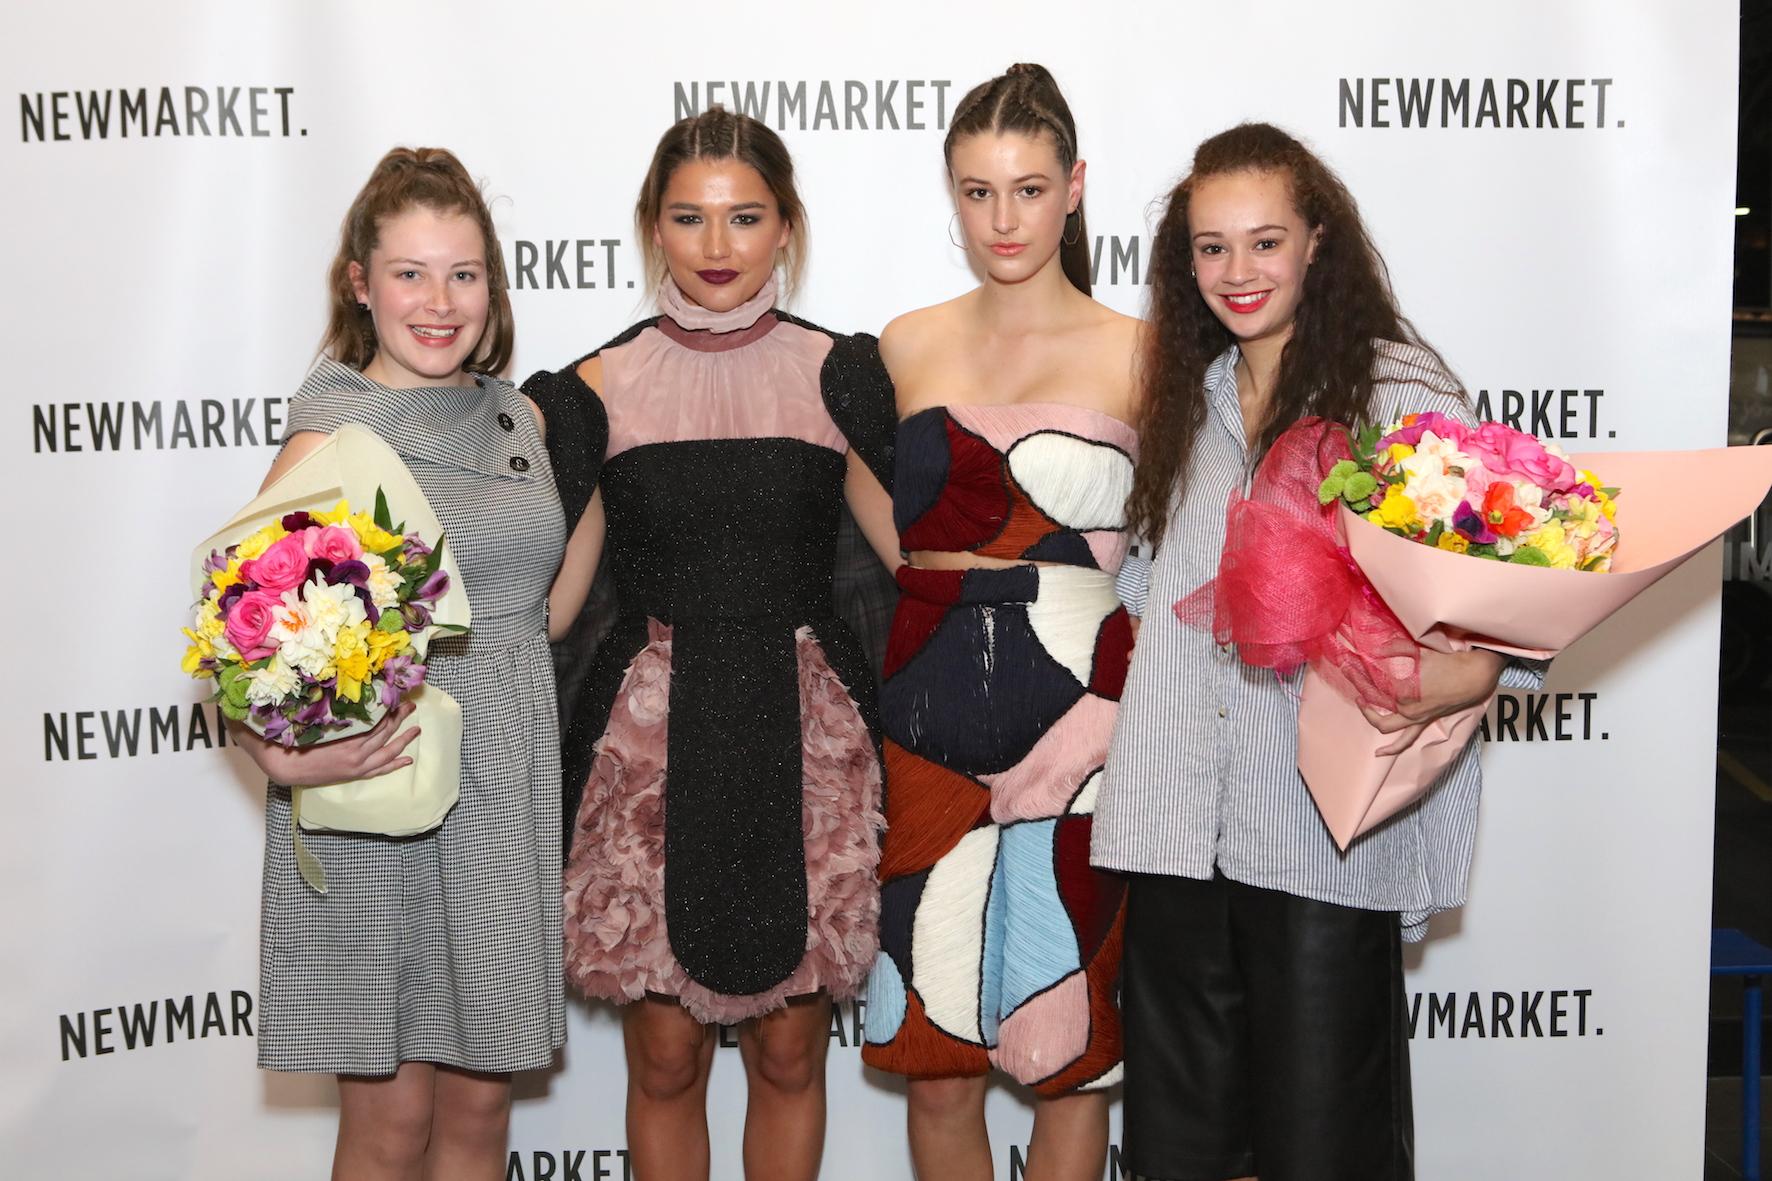 Jodi Walker and Abi Barnes with their winning designs